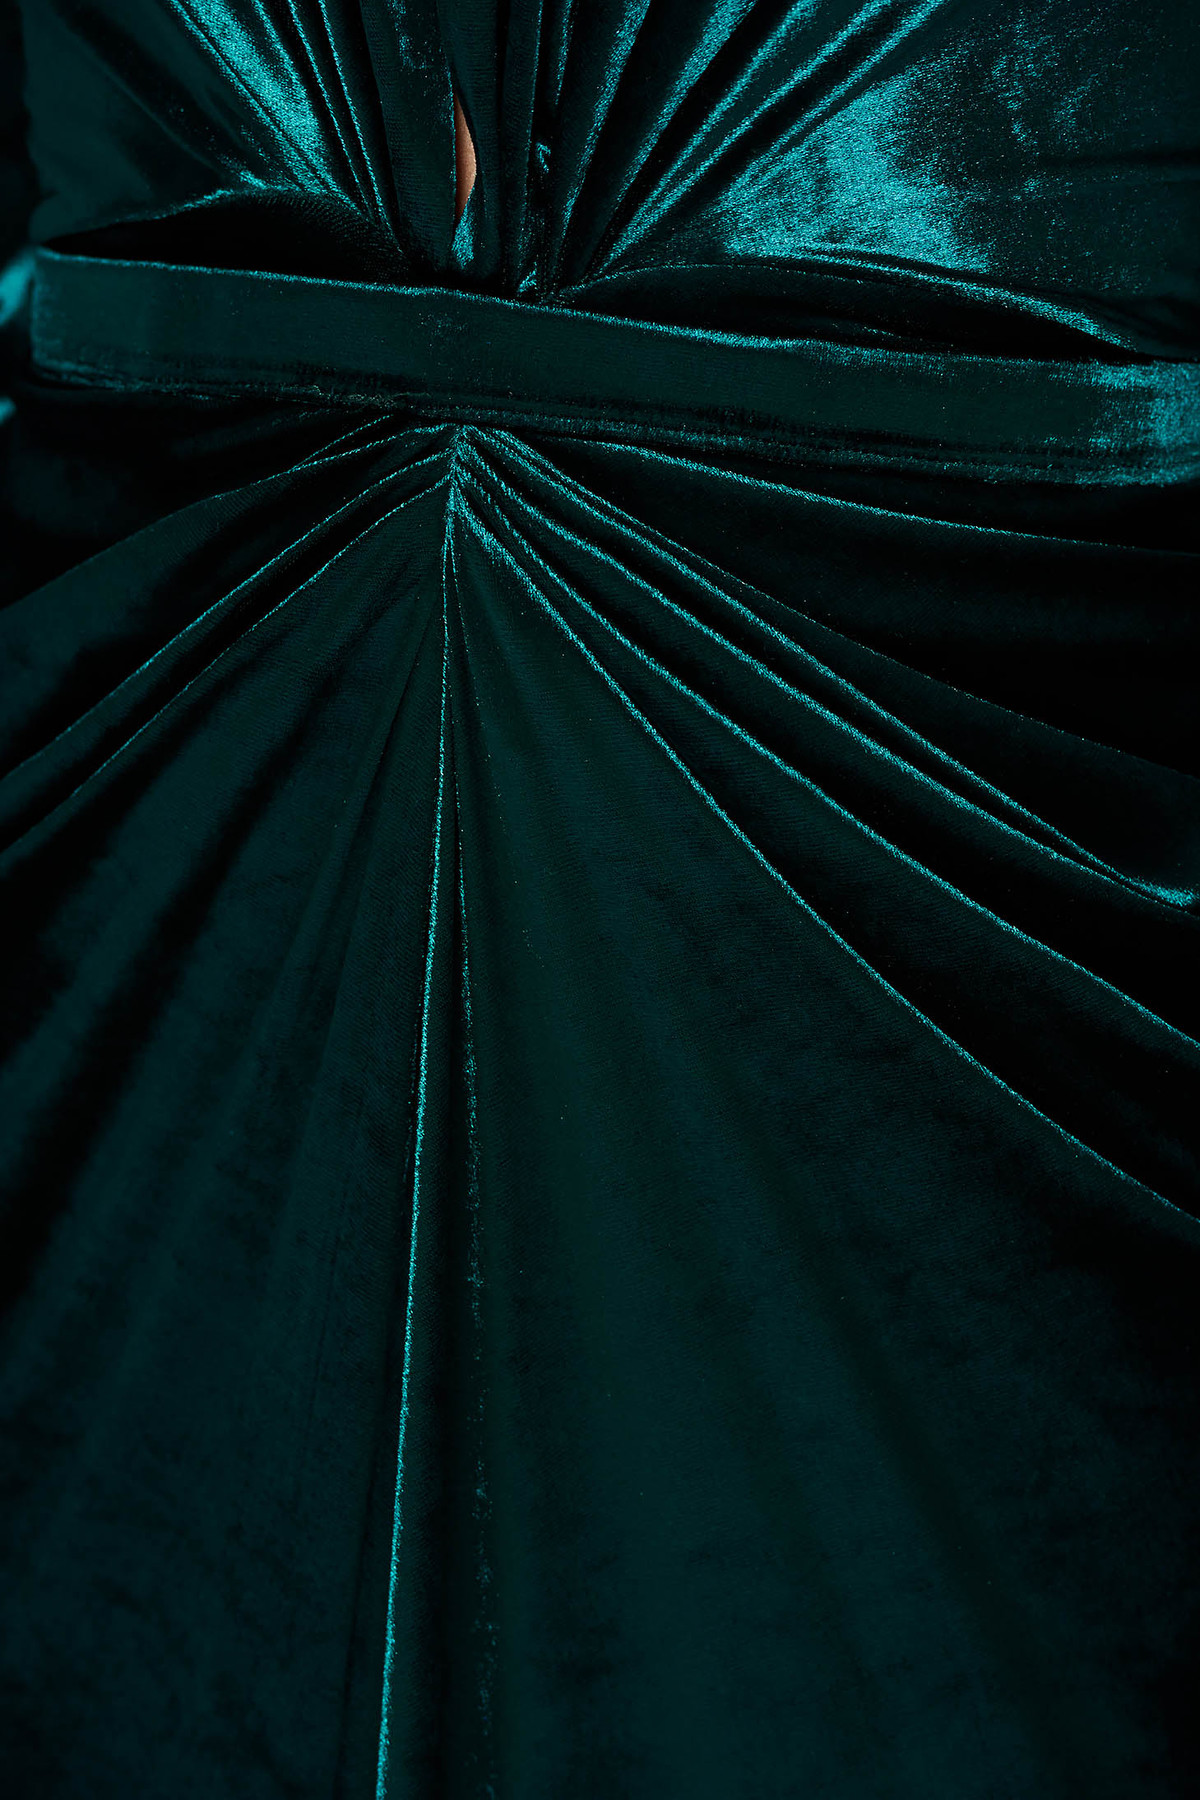 Rochie Ana Radu verde de lux tip sirena din catifea cu decolteu adanc accesorizata cu cordon